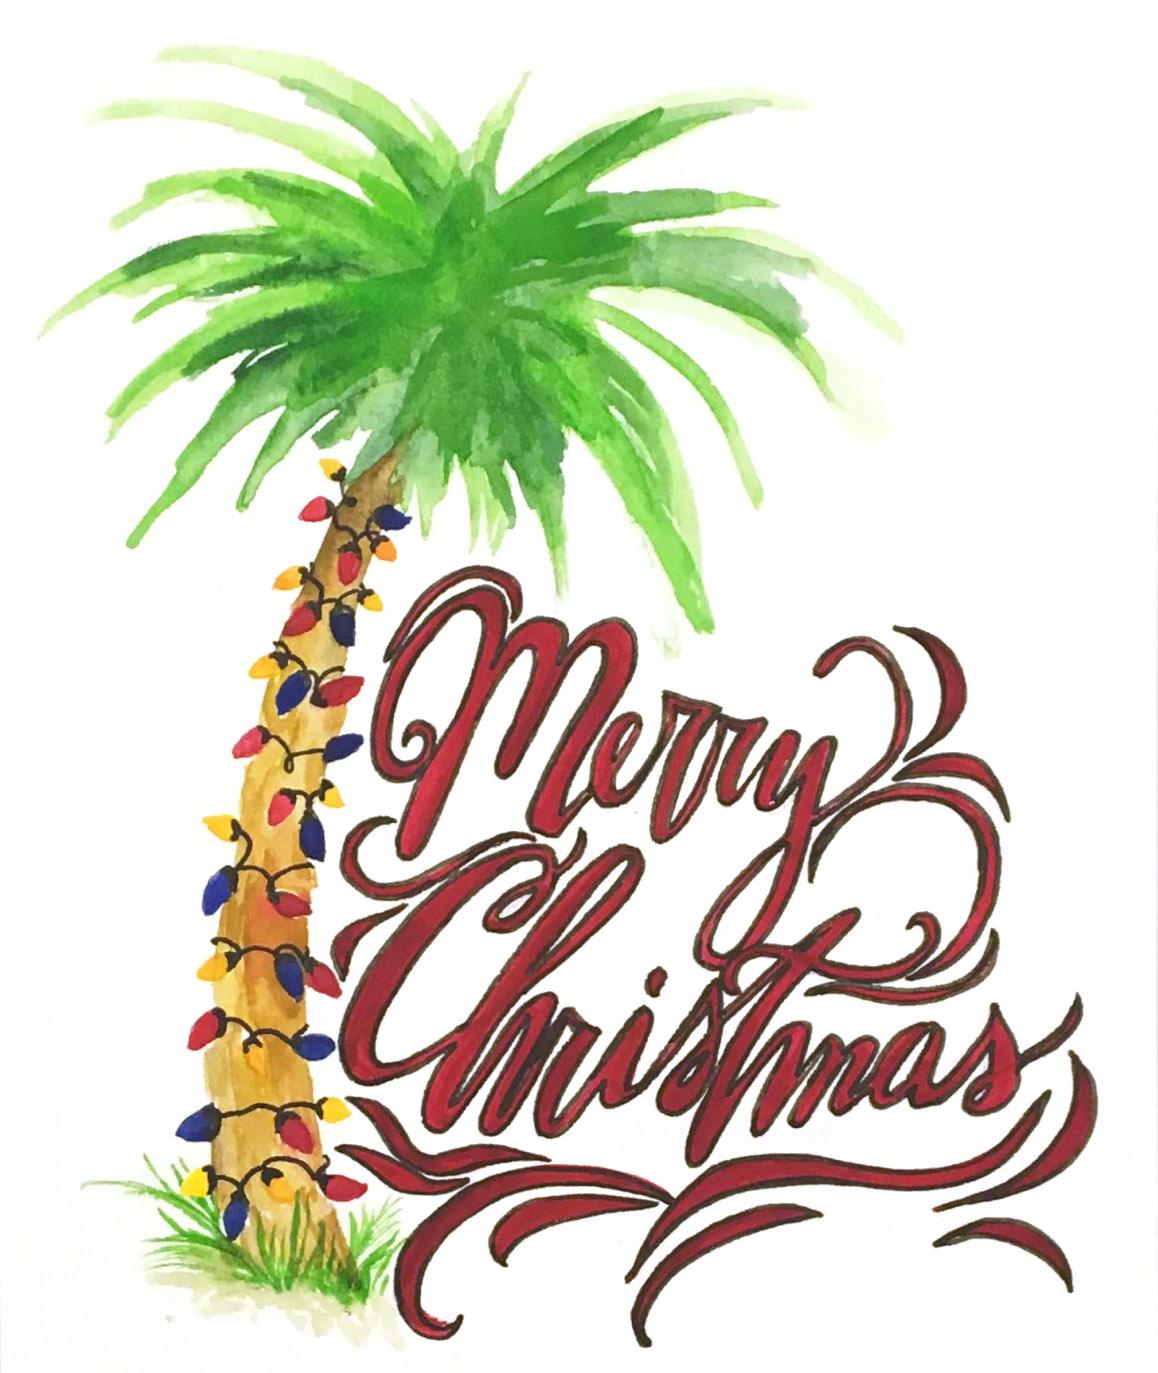 Palmtreechristmas.jpg